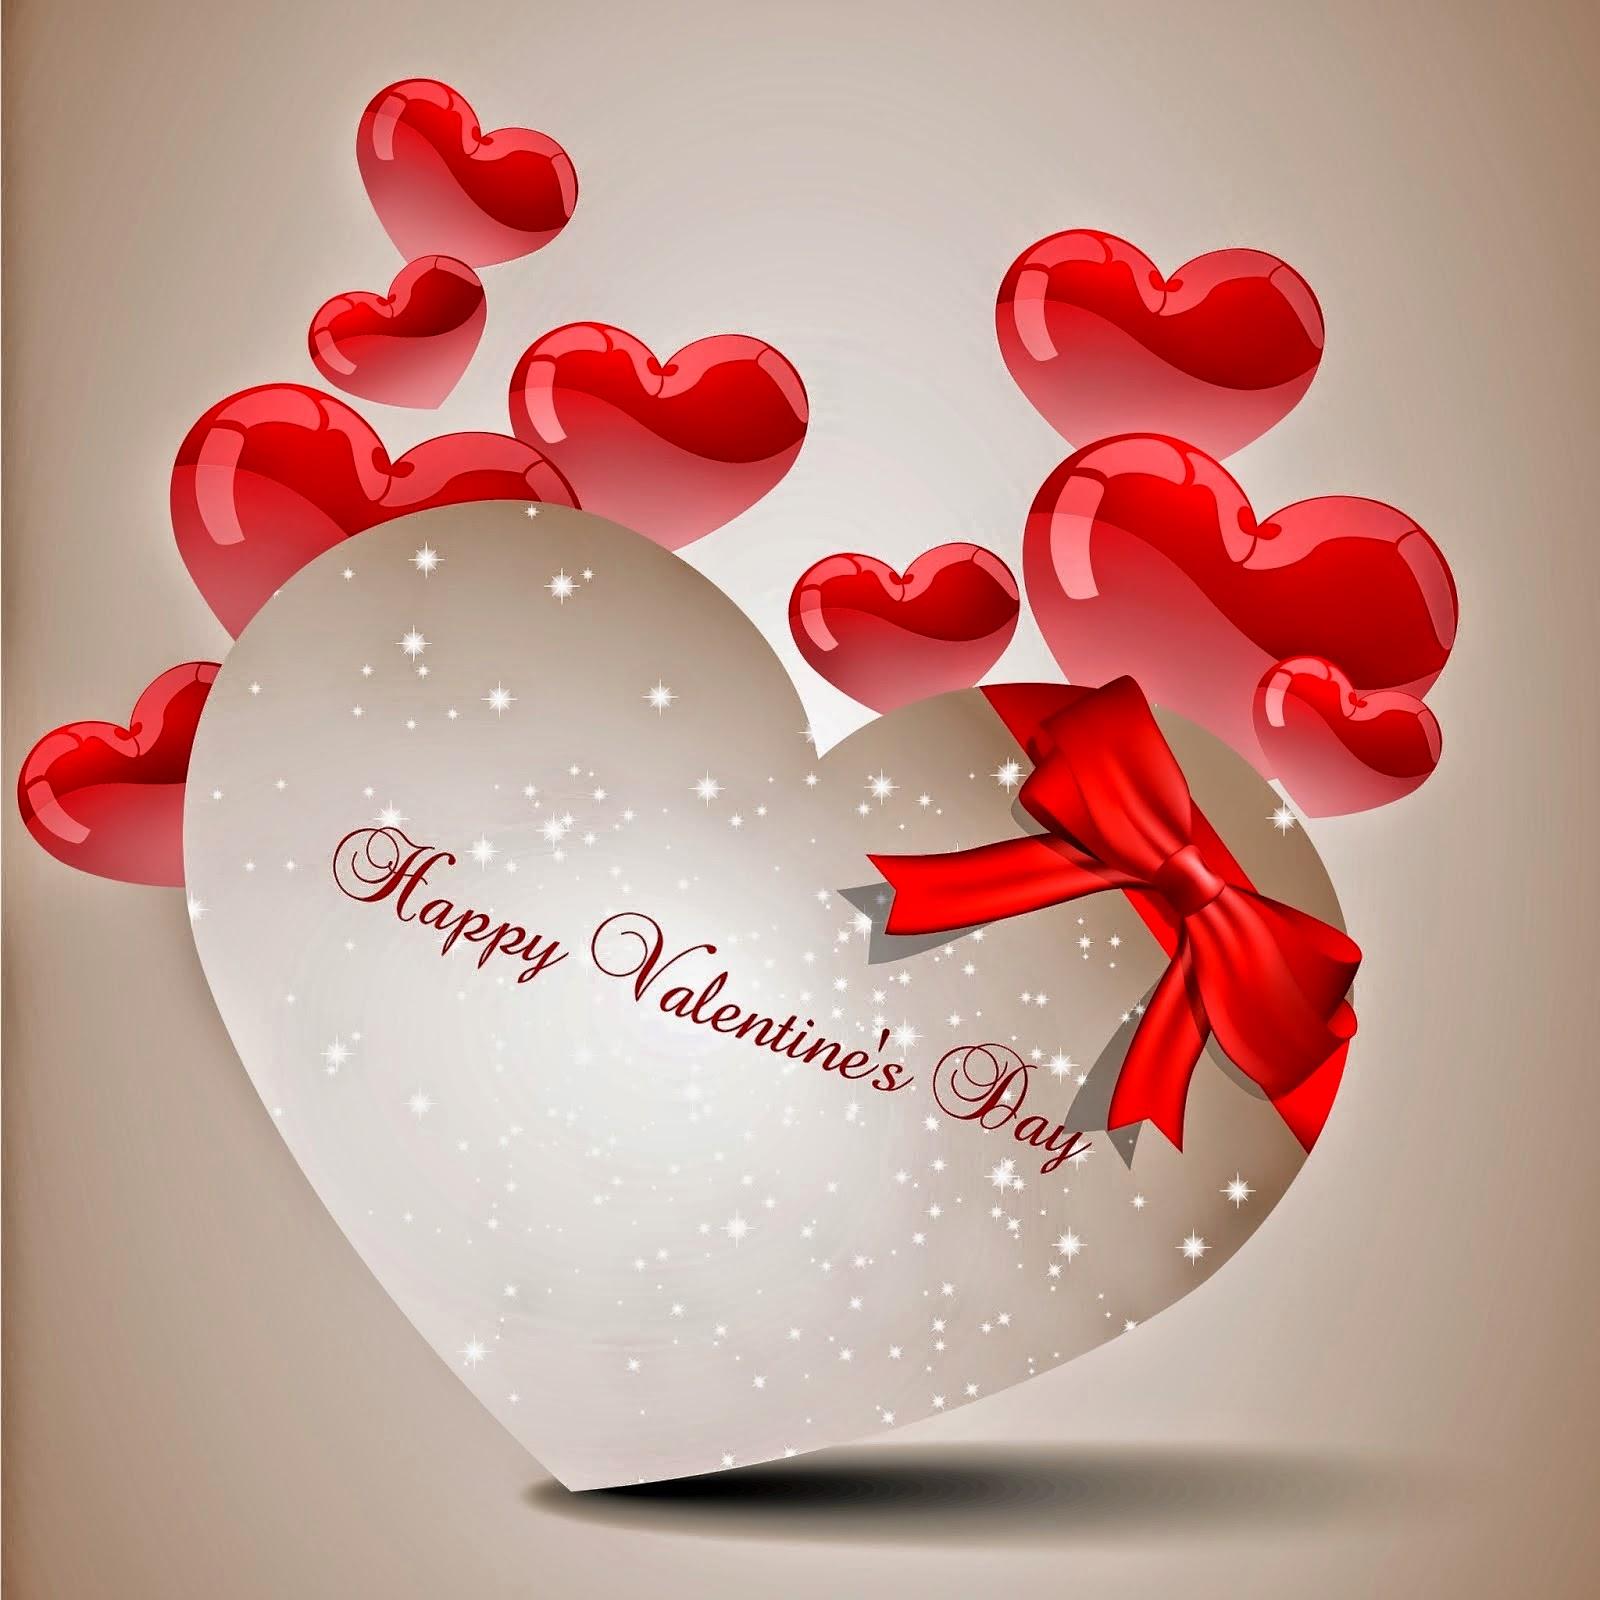 Valentines Day Whatsapp Messages